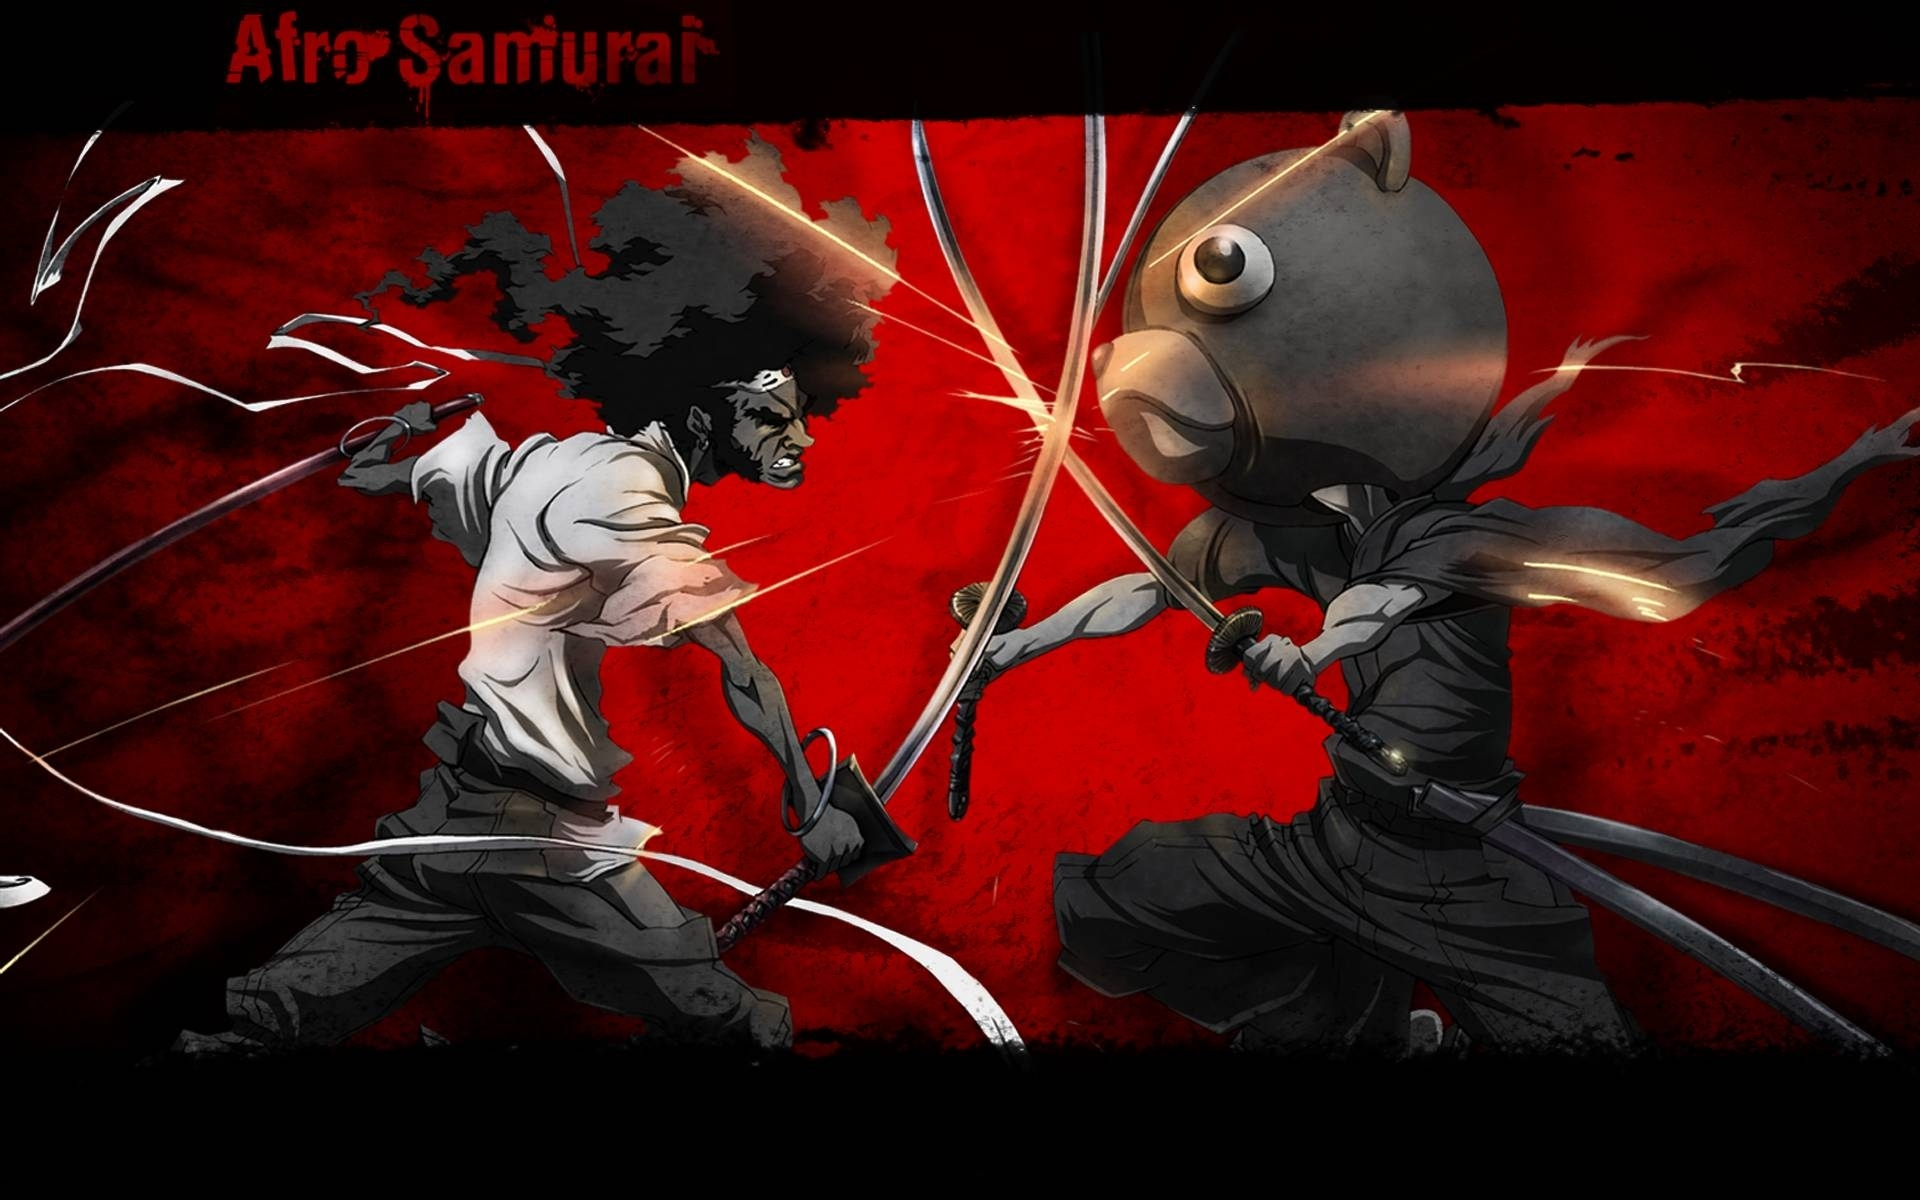 afro samurai cartoon hd image wallpaper for ipad - cartoons wallpapers